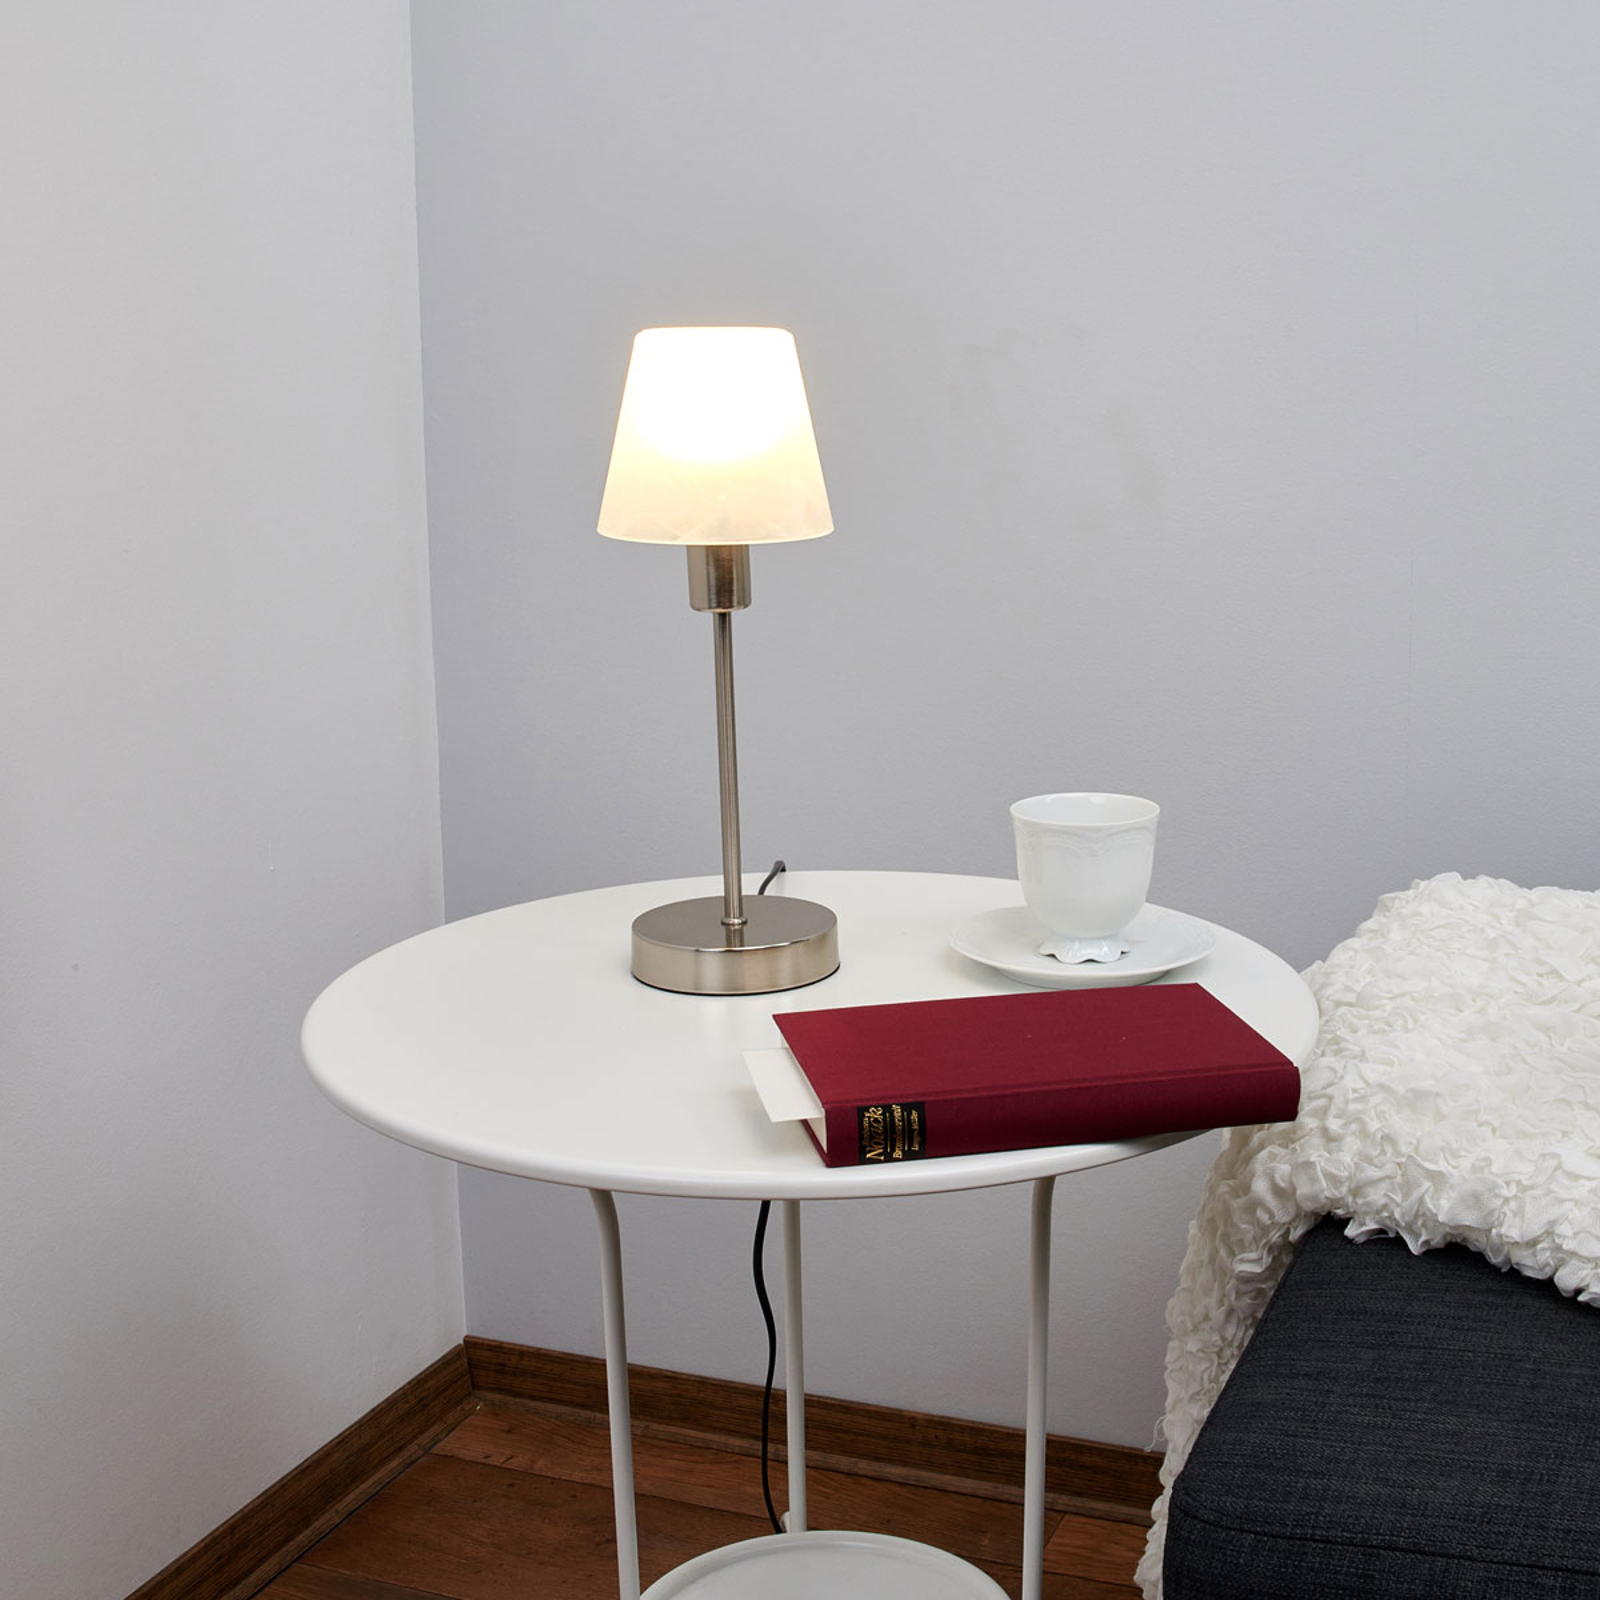 Lampka nocna AVARIN z żarówką LED